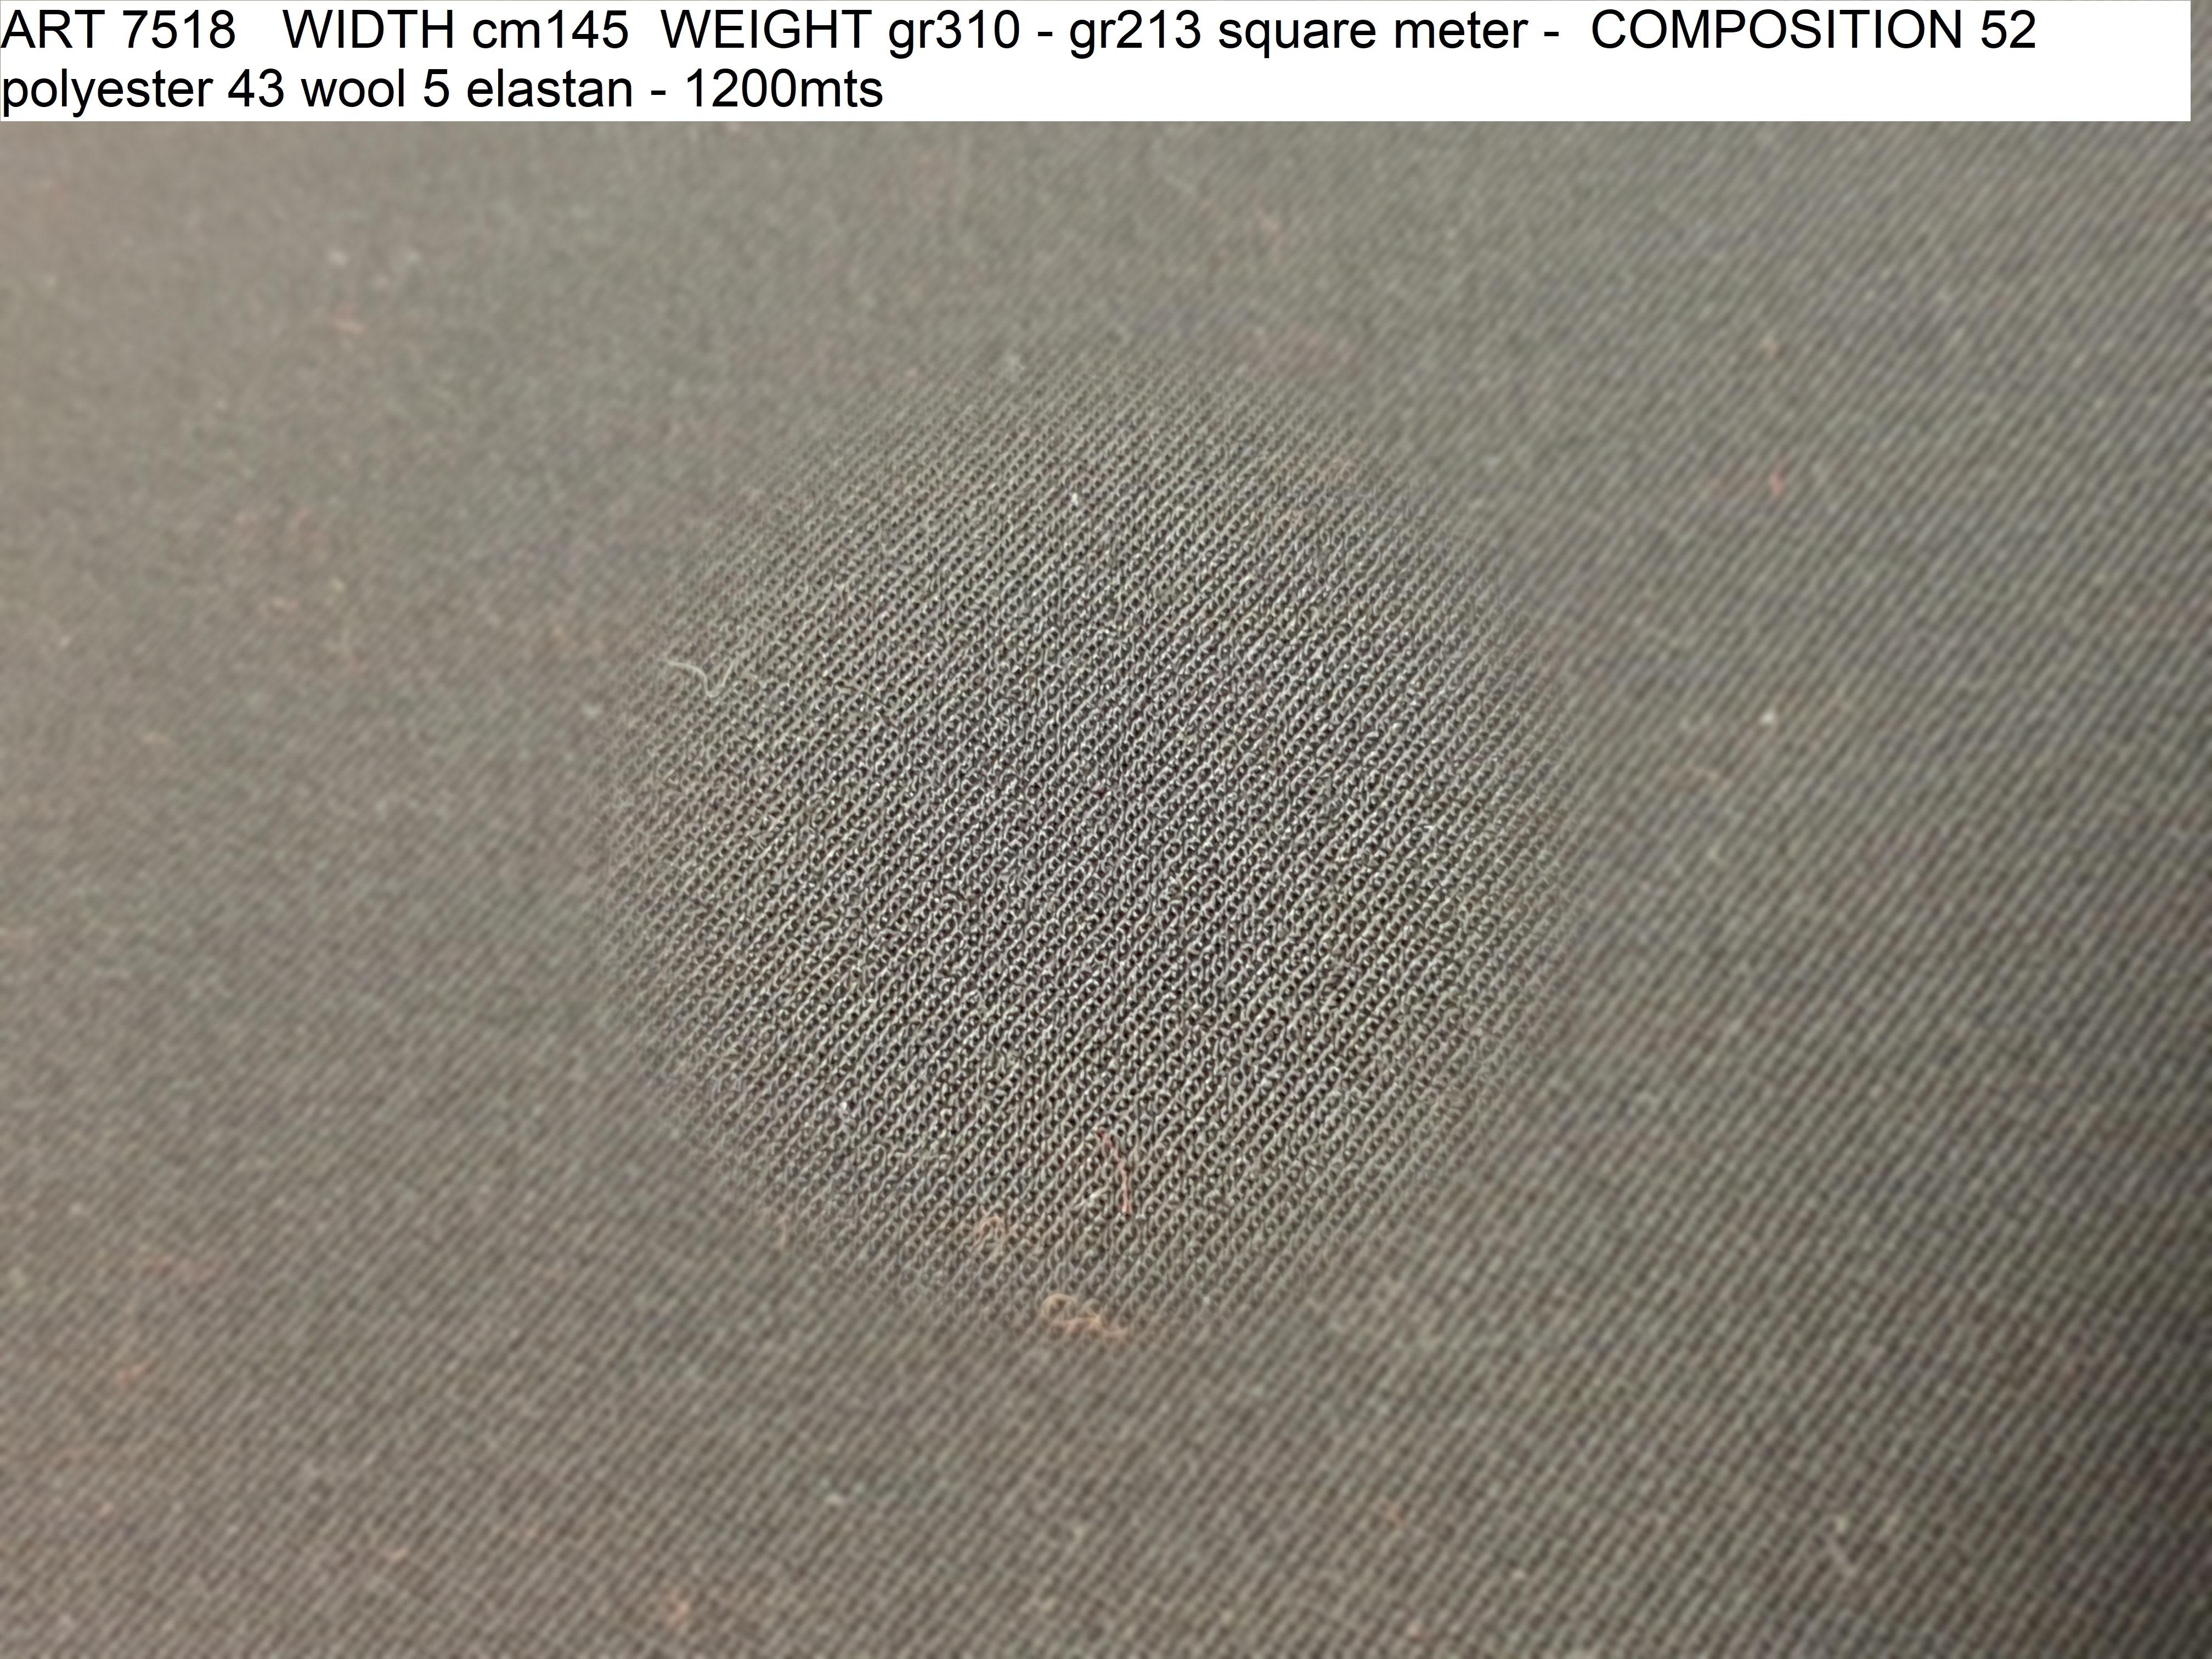 ART 7518 WIDTH cm145 WEIGHT gr310 - gr213 square meter - COMPOSITION 52 polyester 43 wool 5 elastan - 1200mts